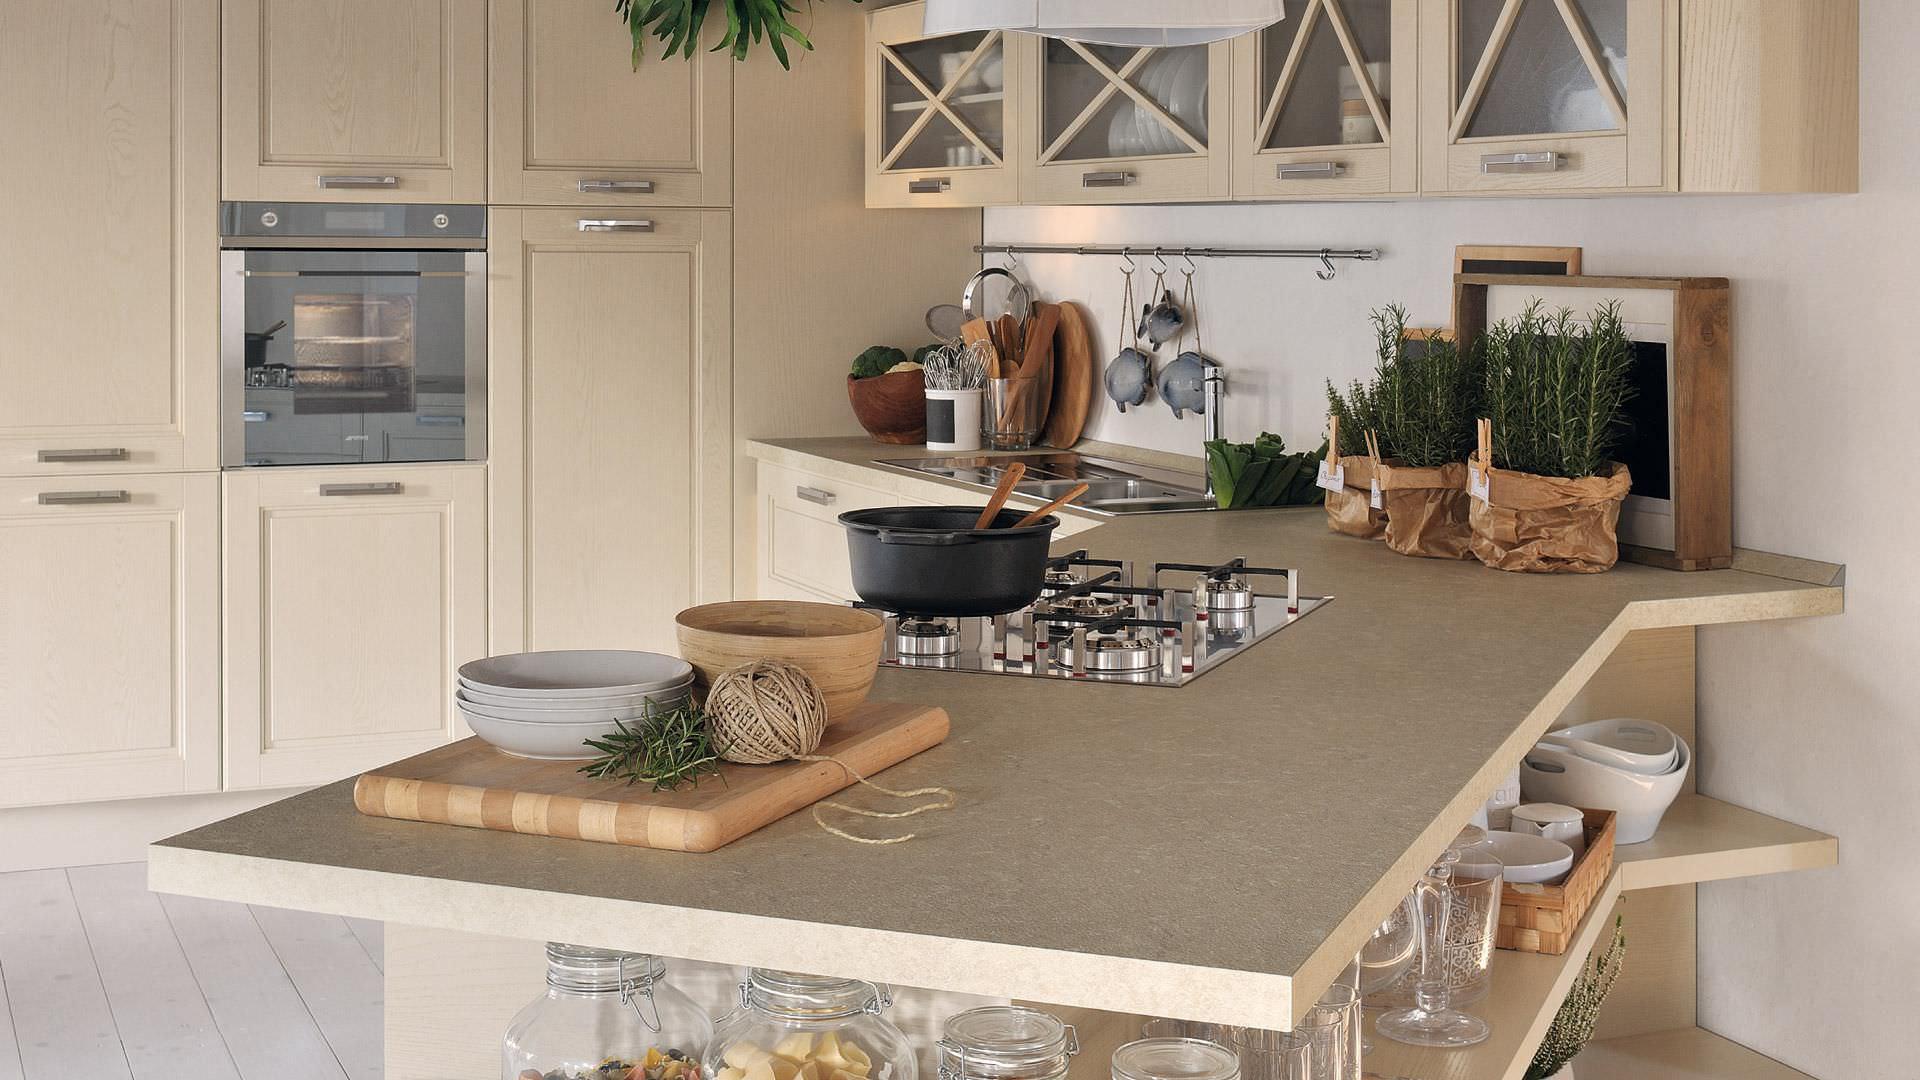 Cuisine classique / en bois massif - AGNESE - CUCINE LUBE